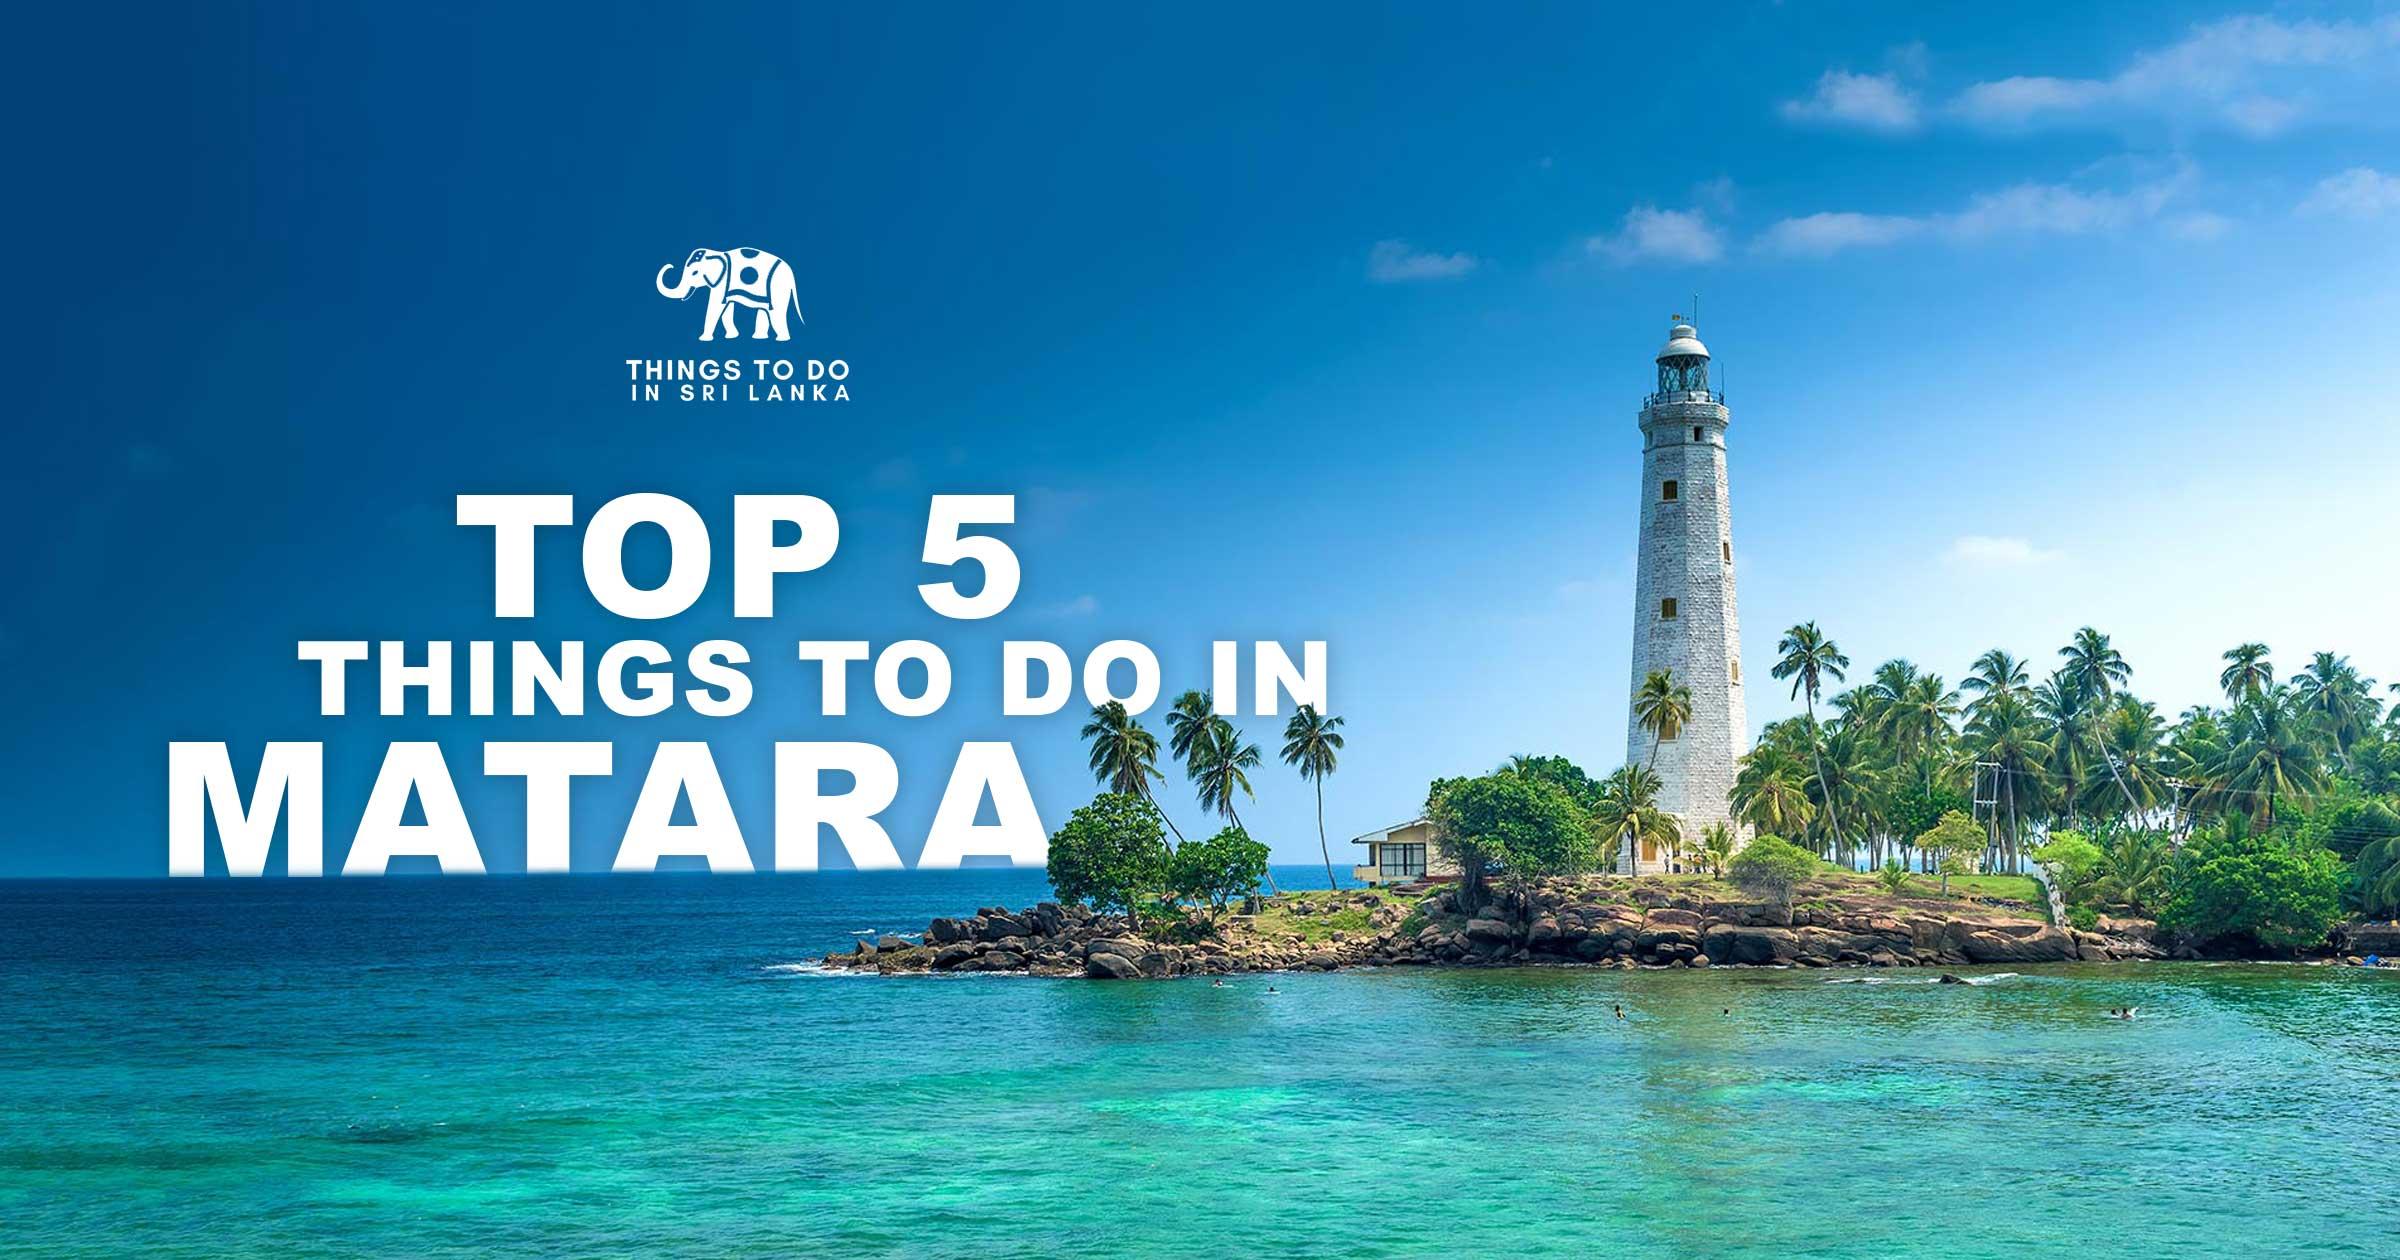 Top 5 things to do in Matara